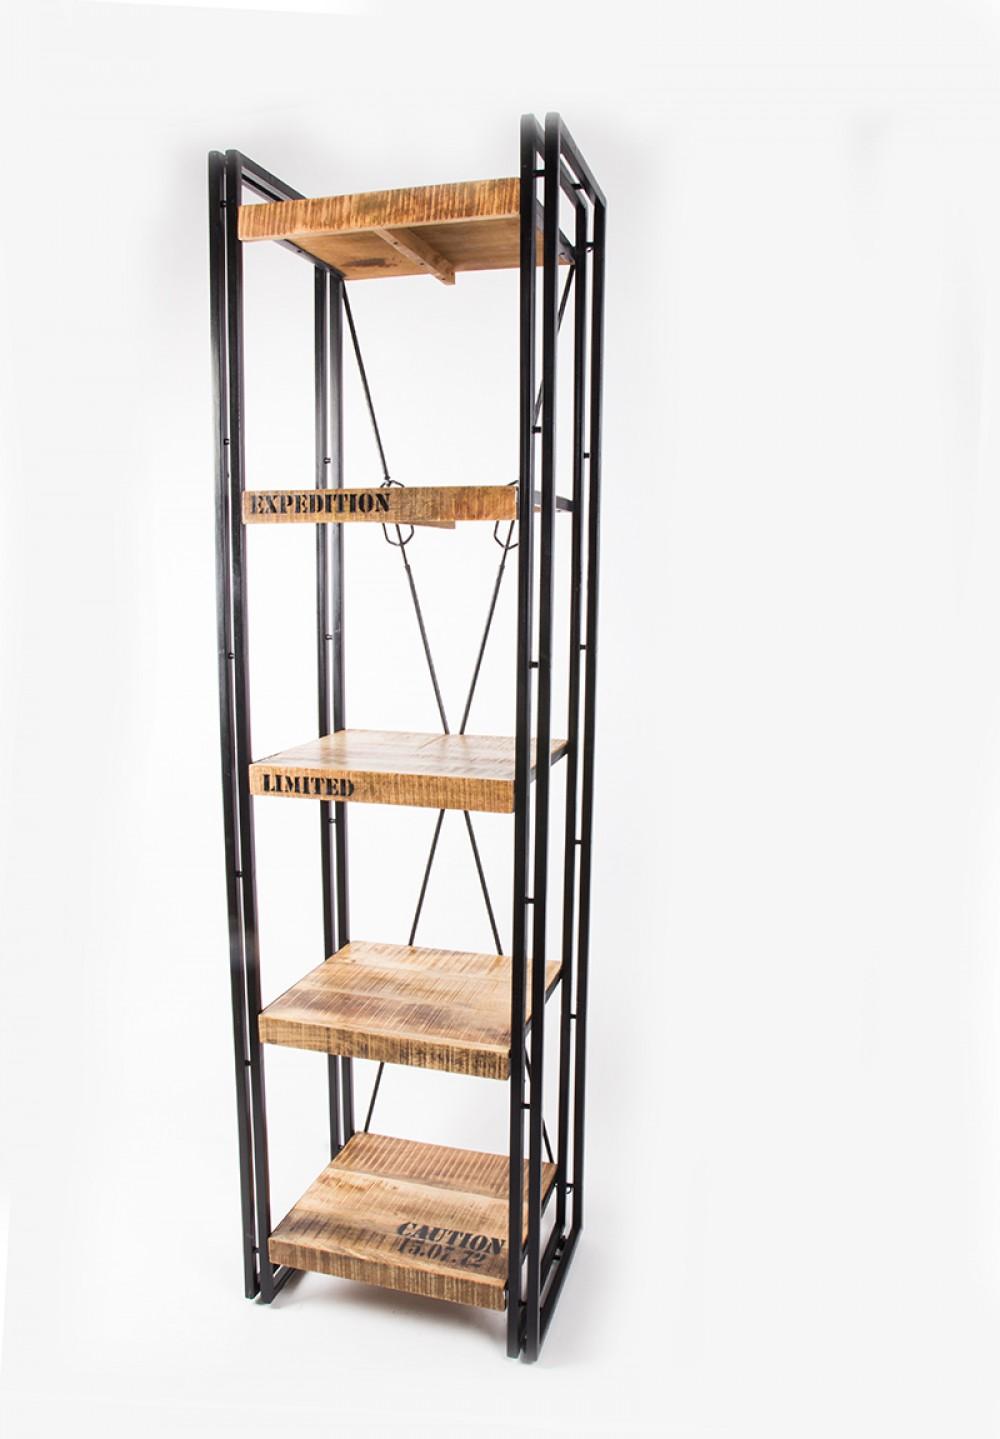 regal mit f nf b den aus massivholz im industriedesign breite 55 h he 200 cm. Black Bedroom Furniture Sets. Home Design Ideas